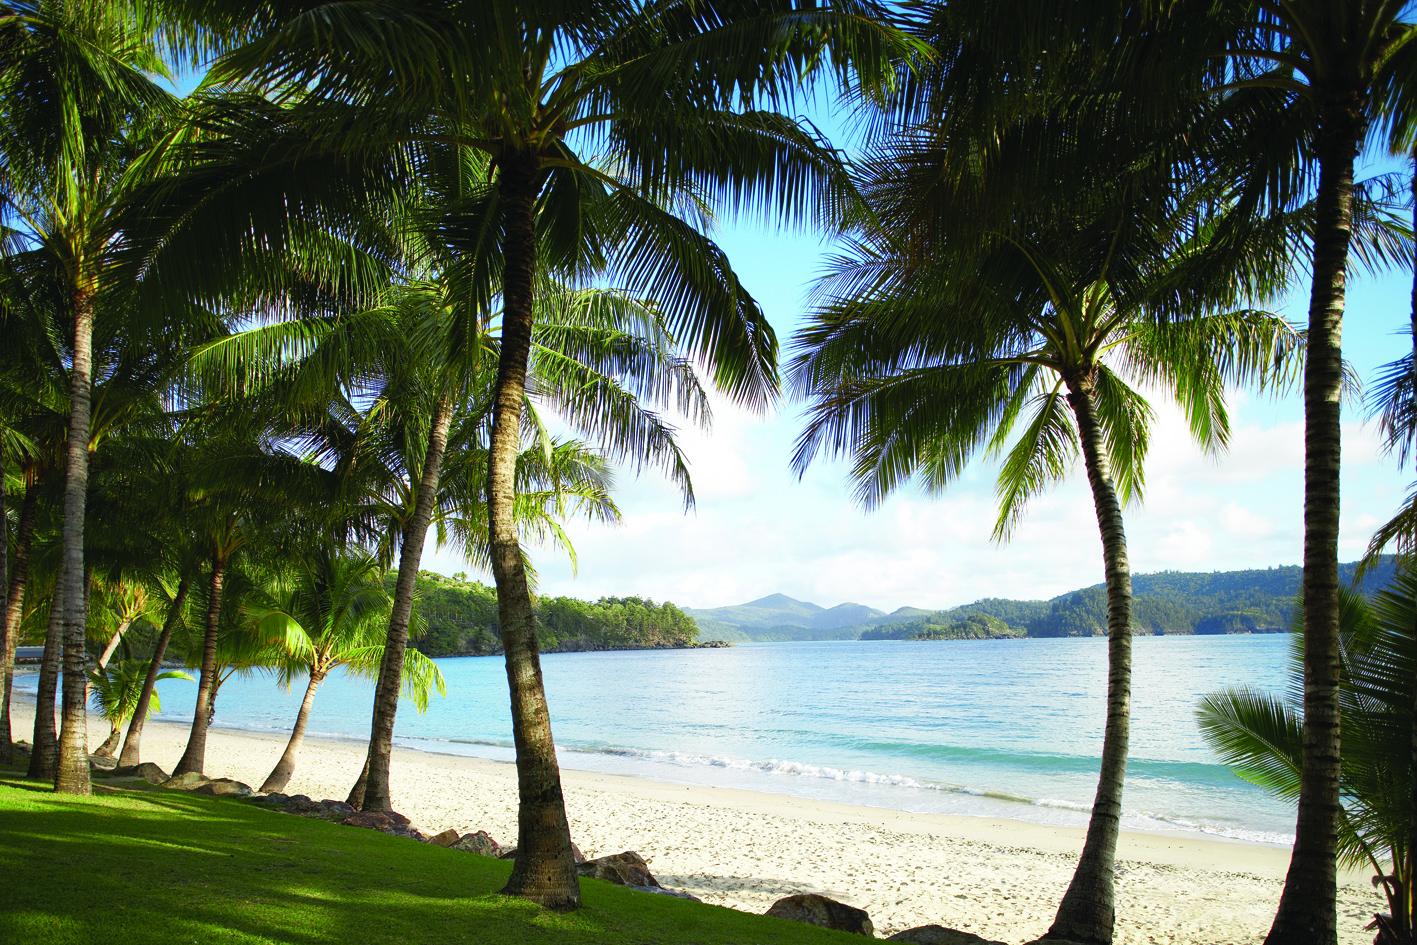 http://2.bp.blogspot.com/-qfuaQ4ZcsrY/Tpf4vI7YlBI/AAAAAAAAAC8/T145QbXVWpw/s1600/Catseye+Beach+-+Landscape.jpg